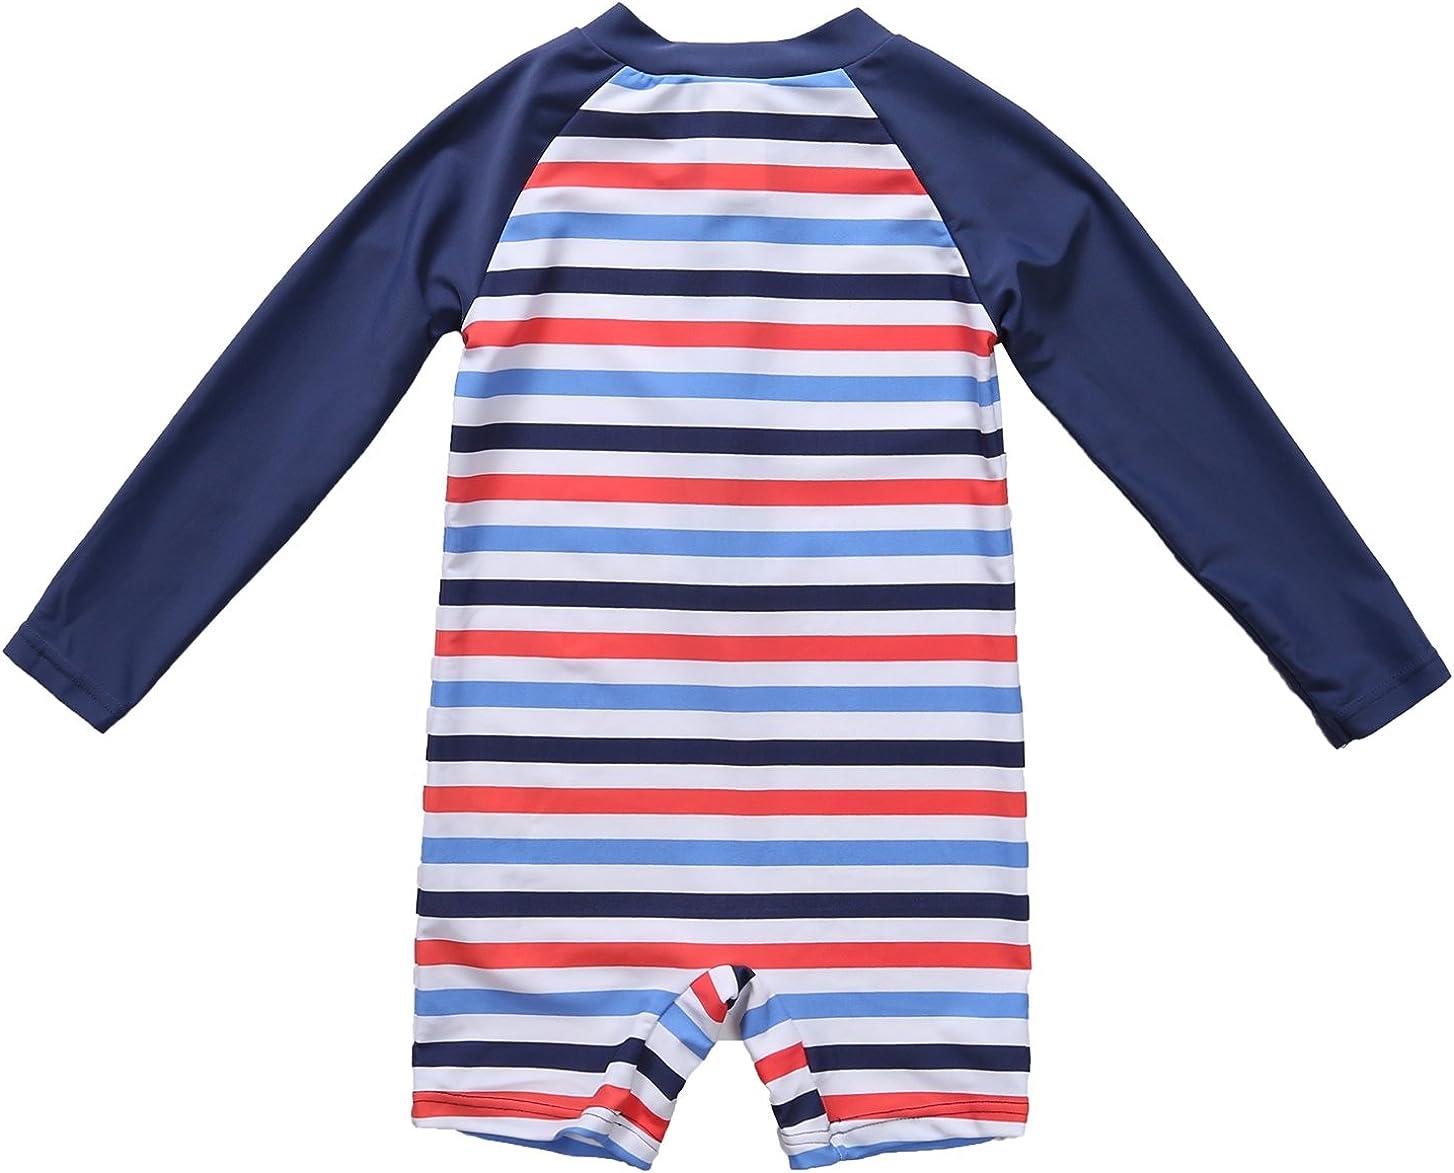 belamo Baby Boys Girls Rashguard Swimsuit Short Sleeve Sun Protection Shirts